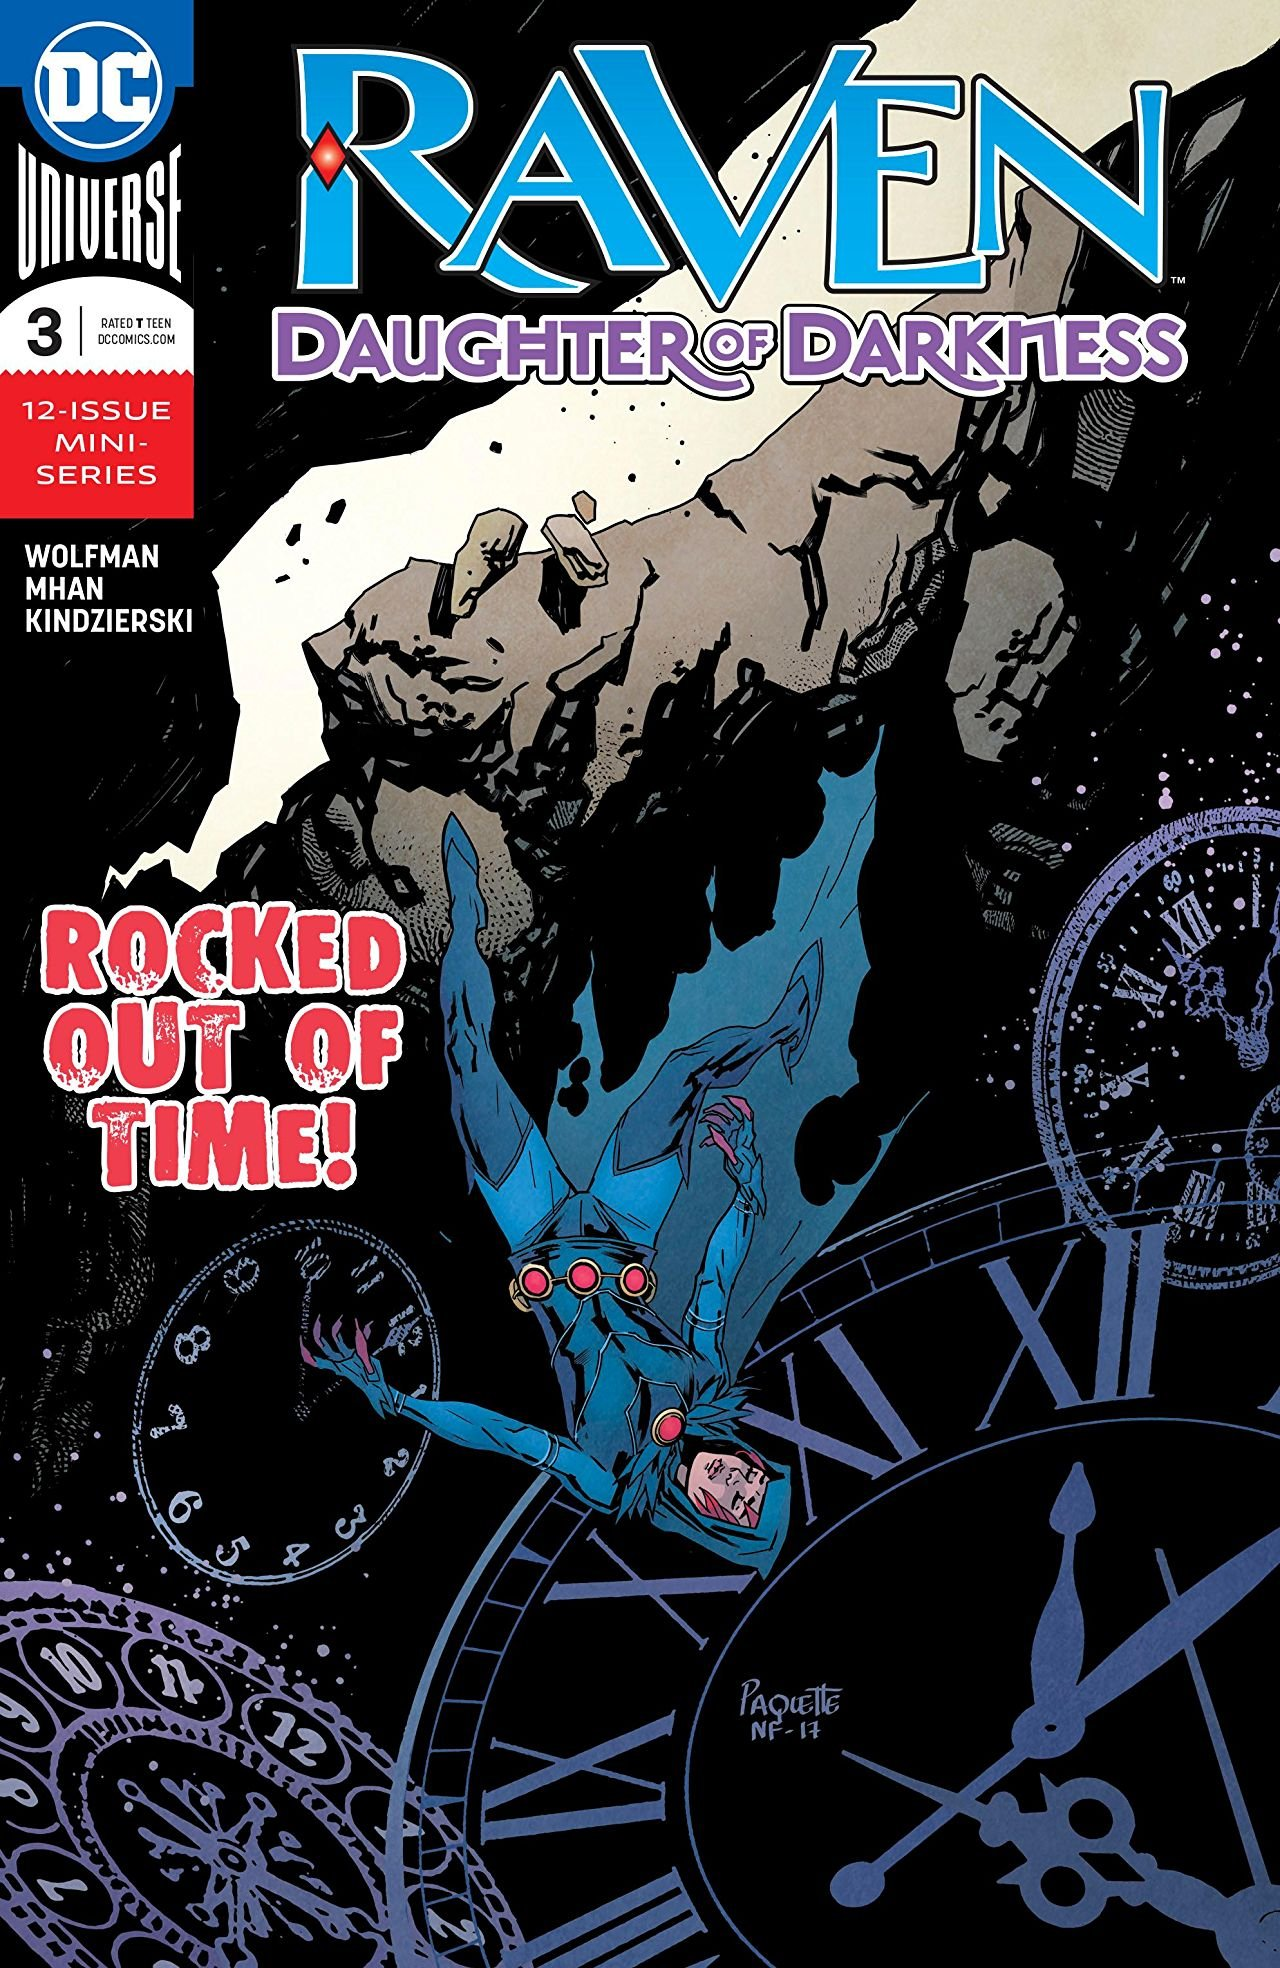 Daughter of Darkness #3 2018 NM DC Comics 1st Print Raven